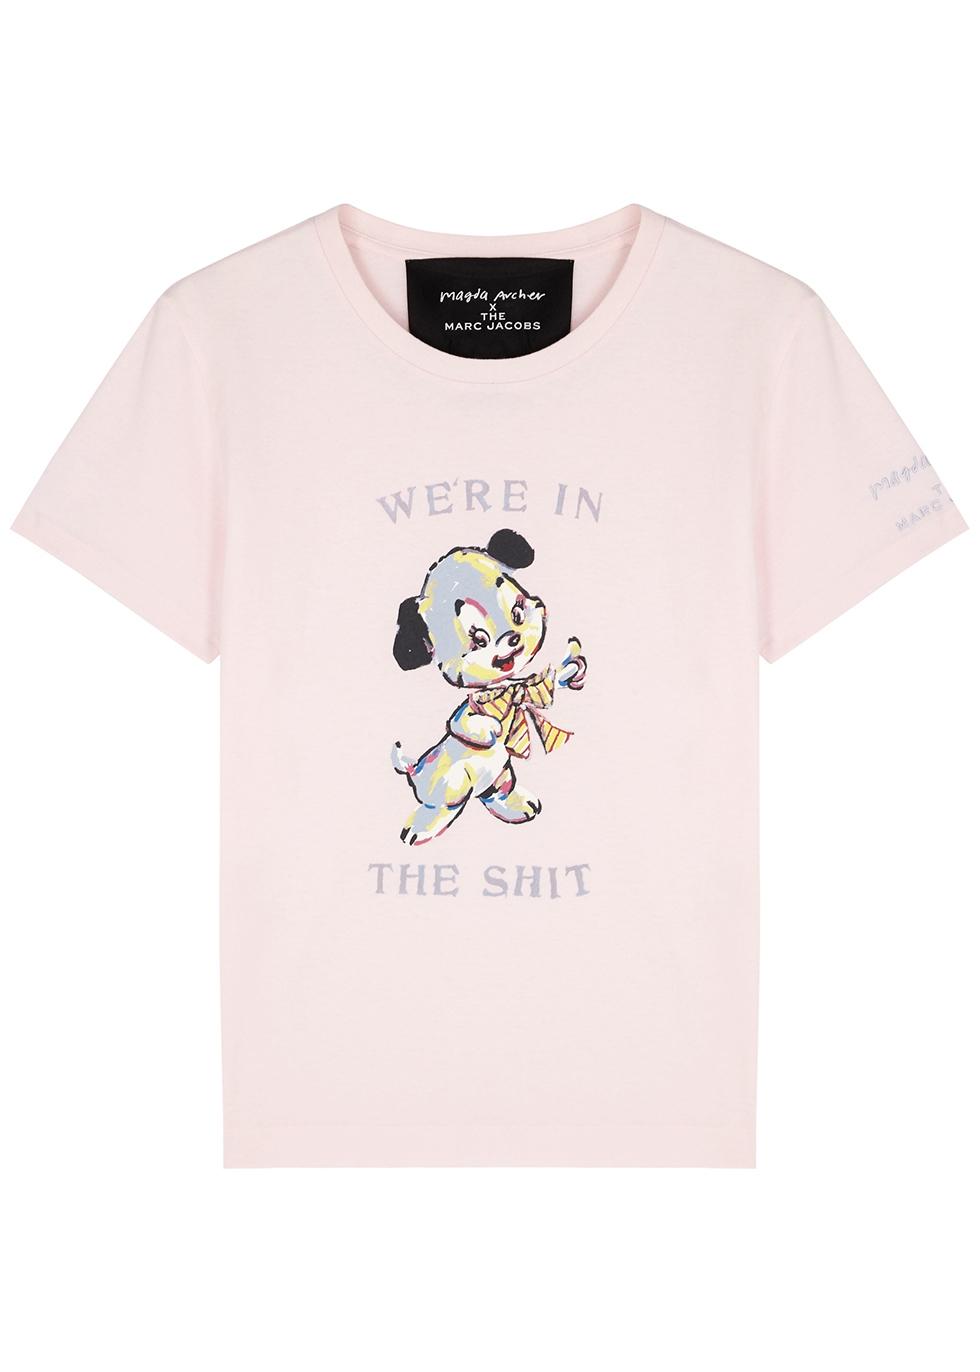 X Magda Archer printed cotton T-shirt